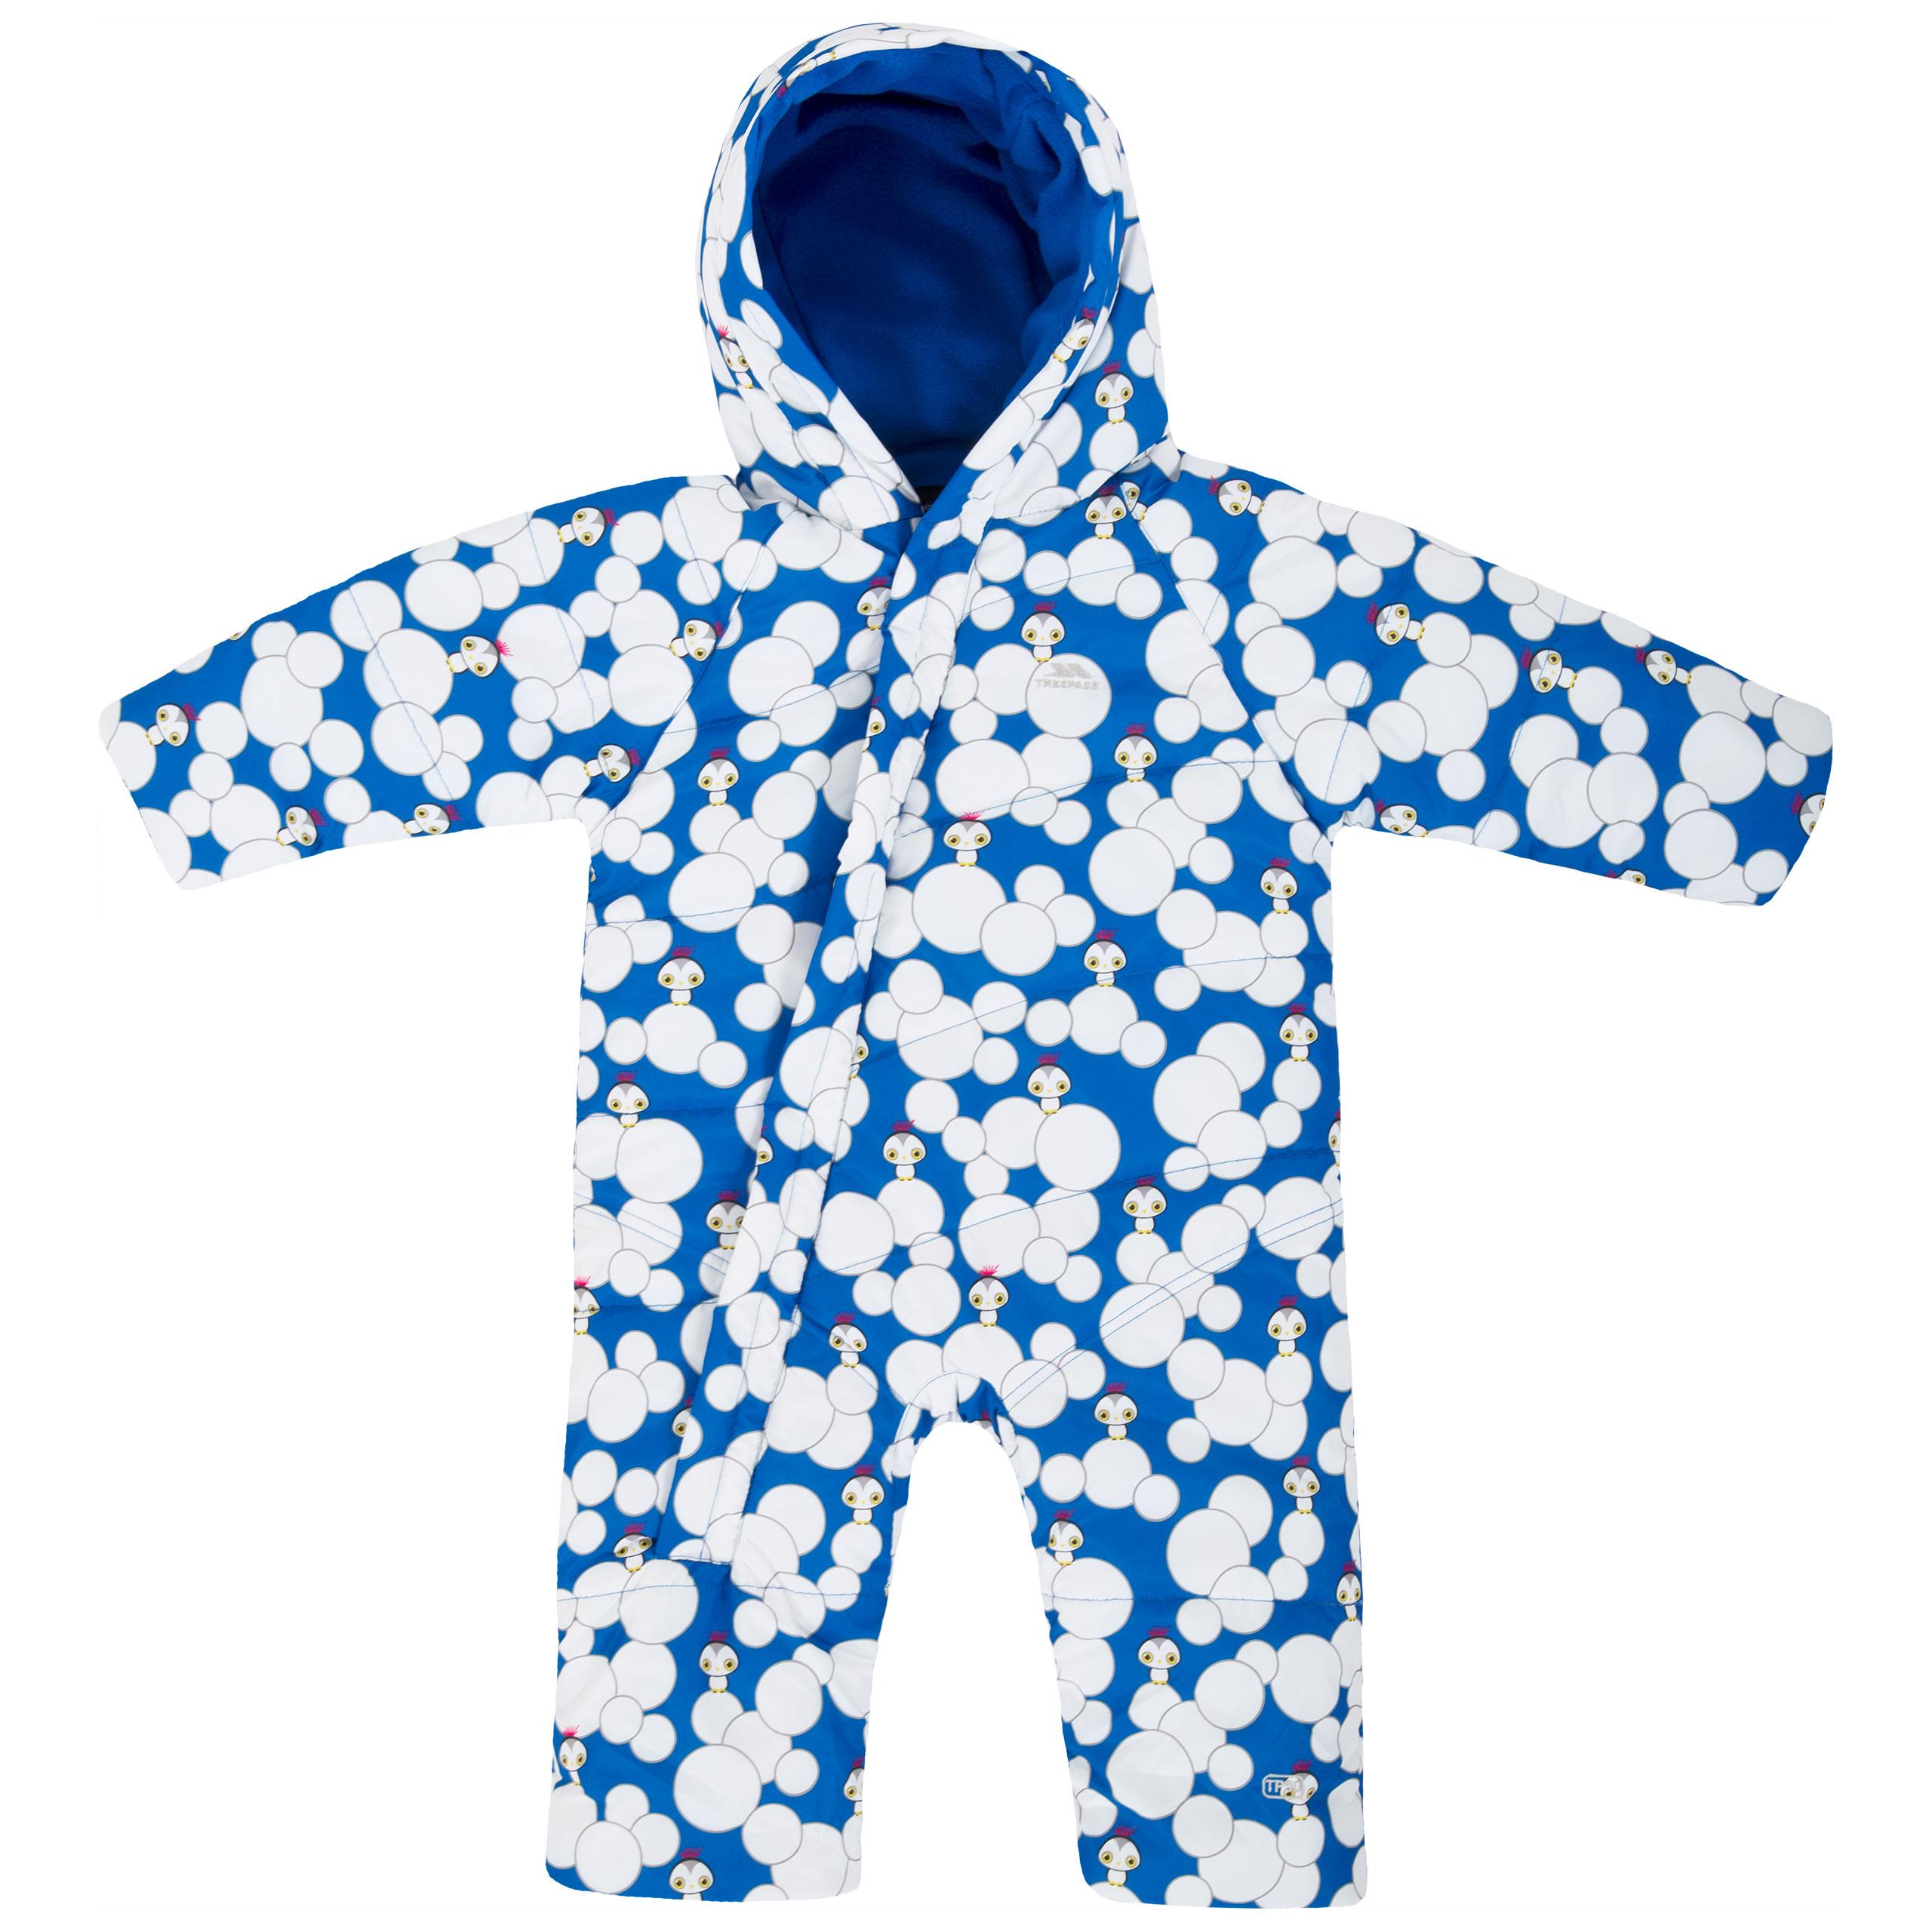 b73342c0d Theodore Babies' Insulated Padded Snowsuit | Trespass UK